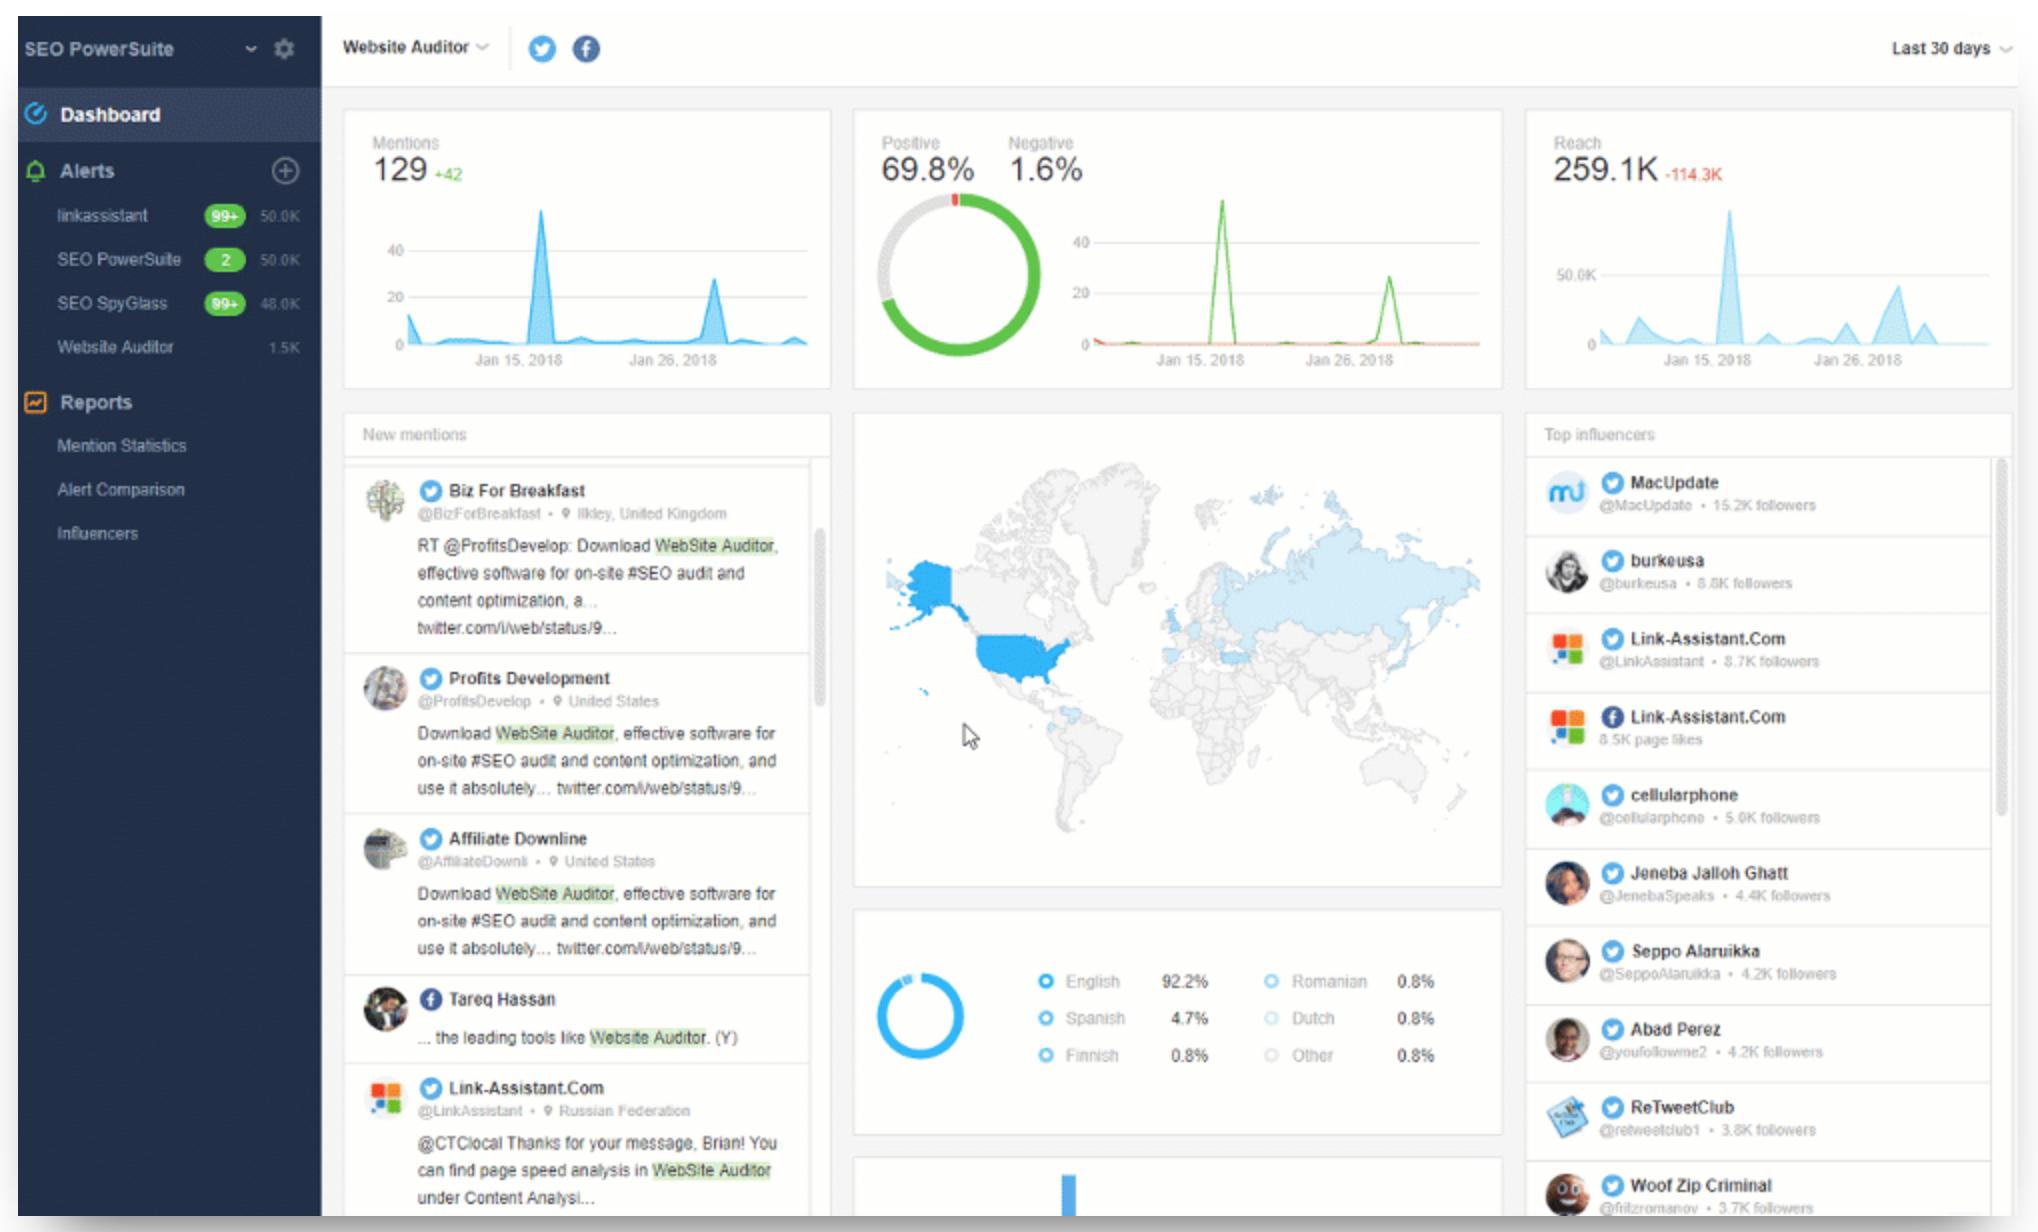 Awario analytic dashboard